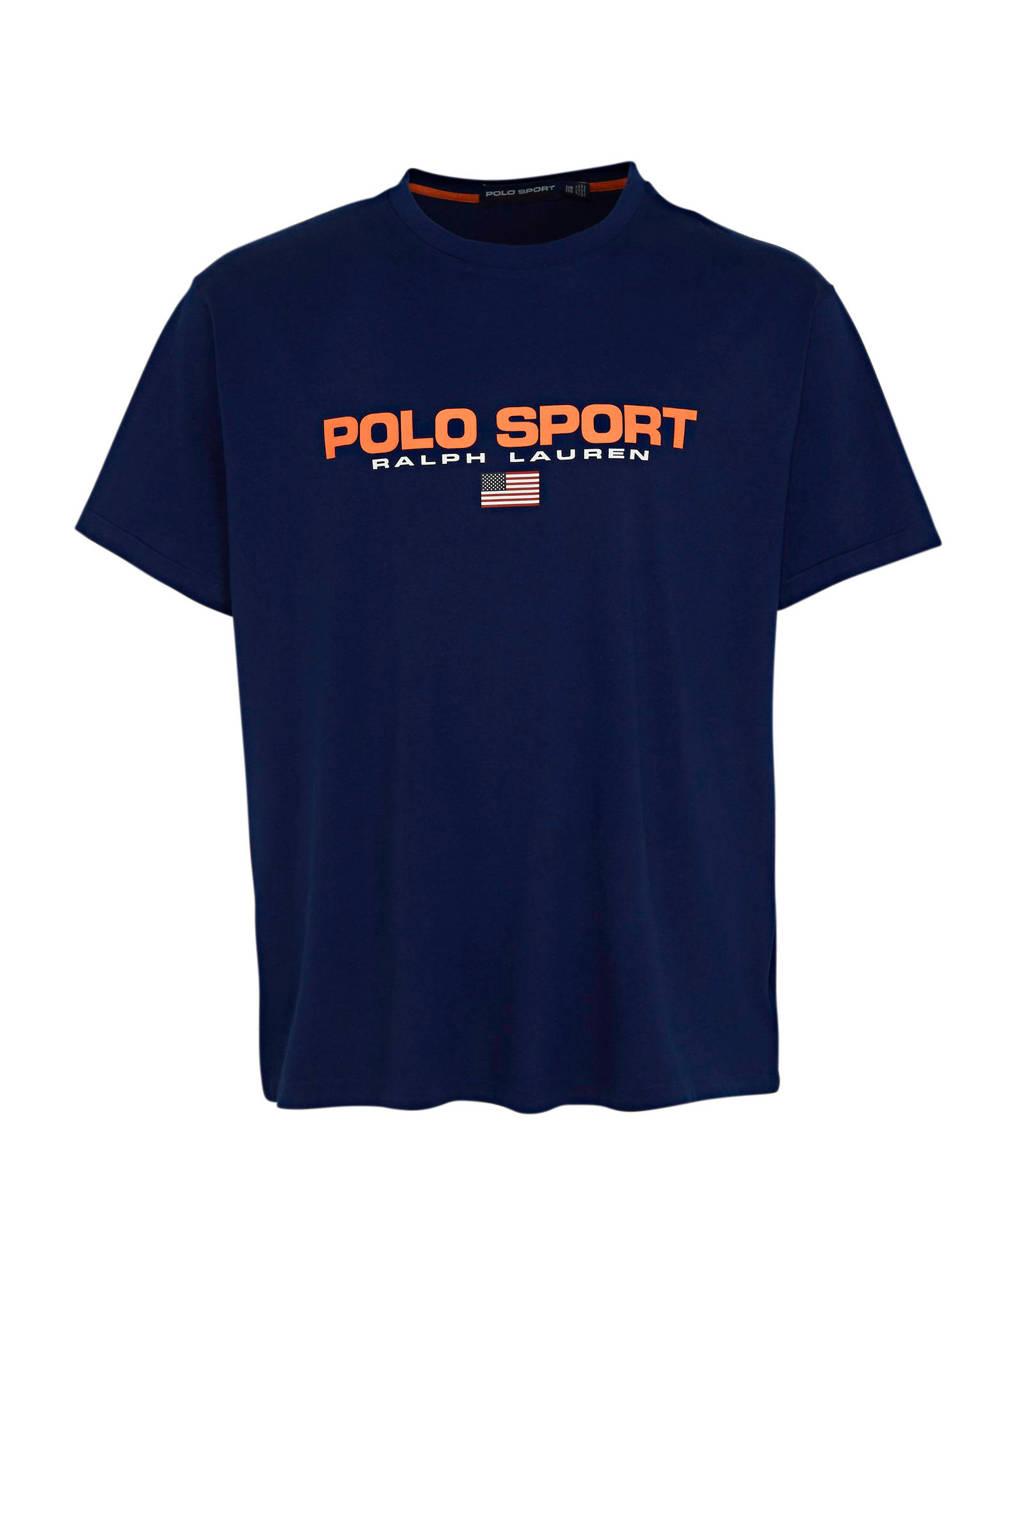 POLO Ralph Lauren Big & Tall +size T-shirt met logo kobaltblauw, Kobaltblauw